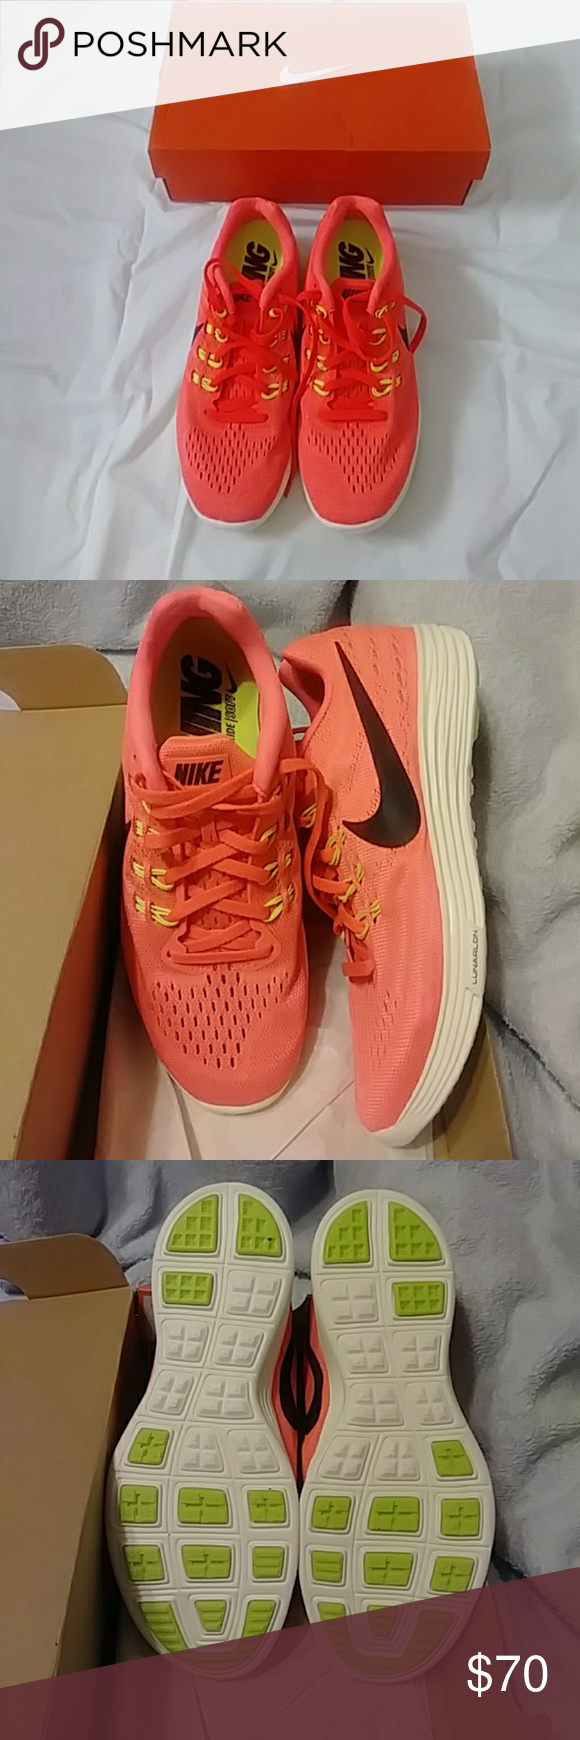 buy popular b06a2 16bdd Women's Nike LunarTempo 2 size 8 NWT in 2018 | My Posh Picks ...